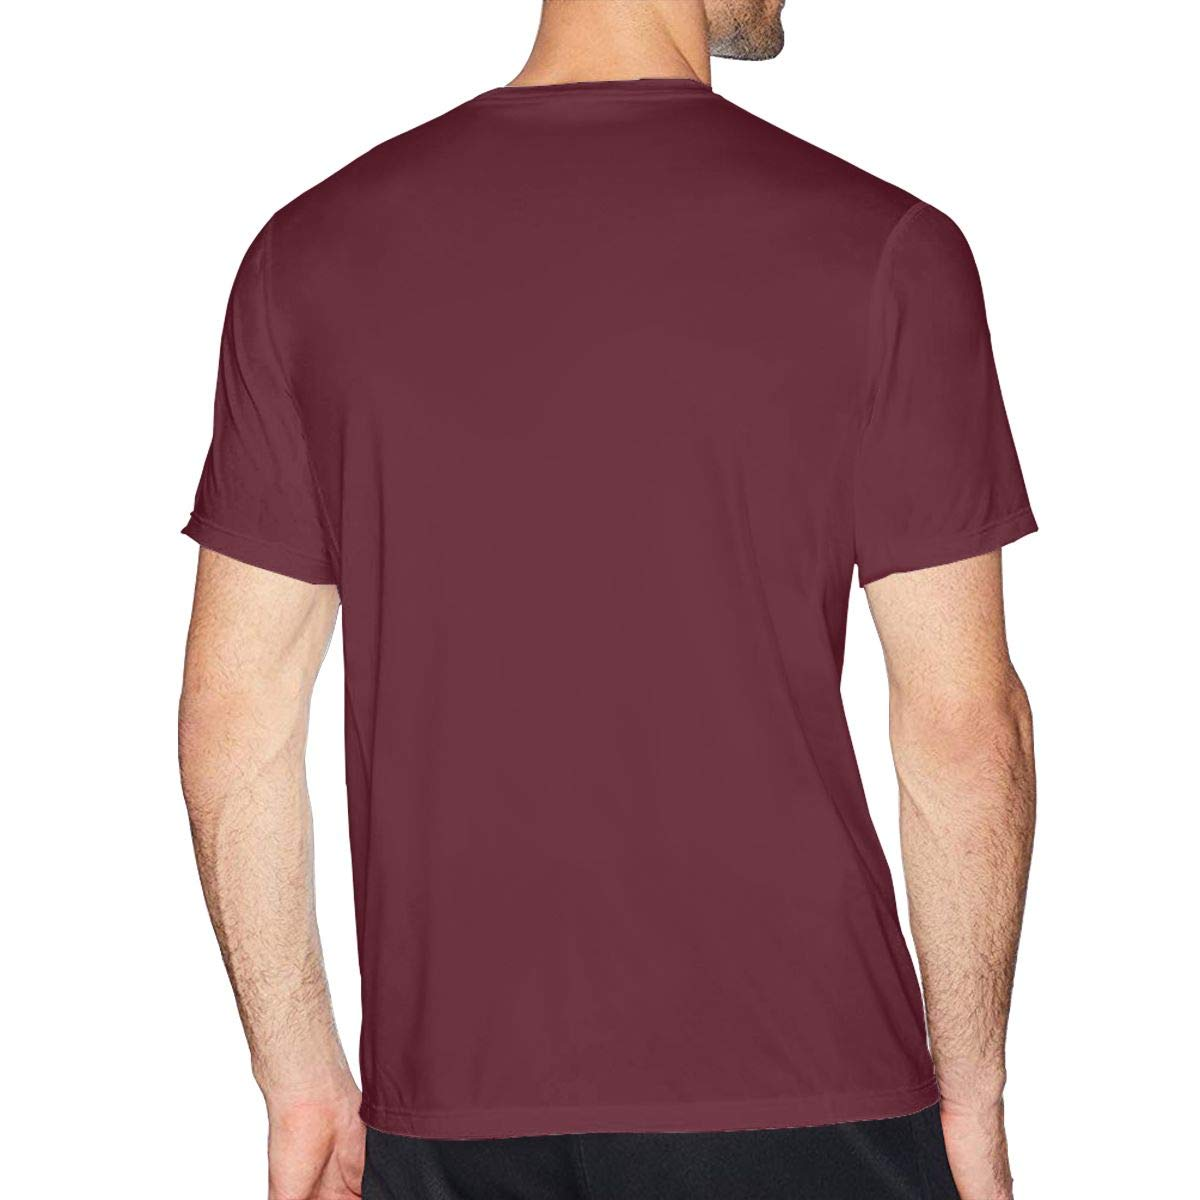 UfashionU Mens Summer T-Shirt Pizza Hut Logo T Shirt Casual Shirts for Men Big Boys Short-Sleeve Round Neck Cotton Sport Tops